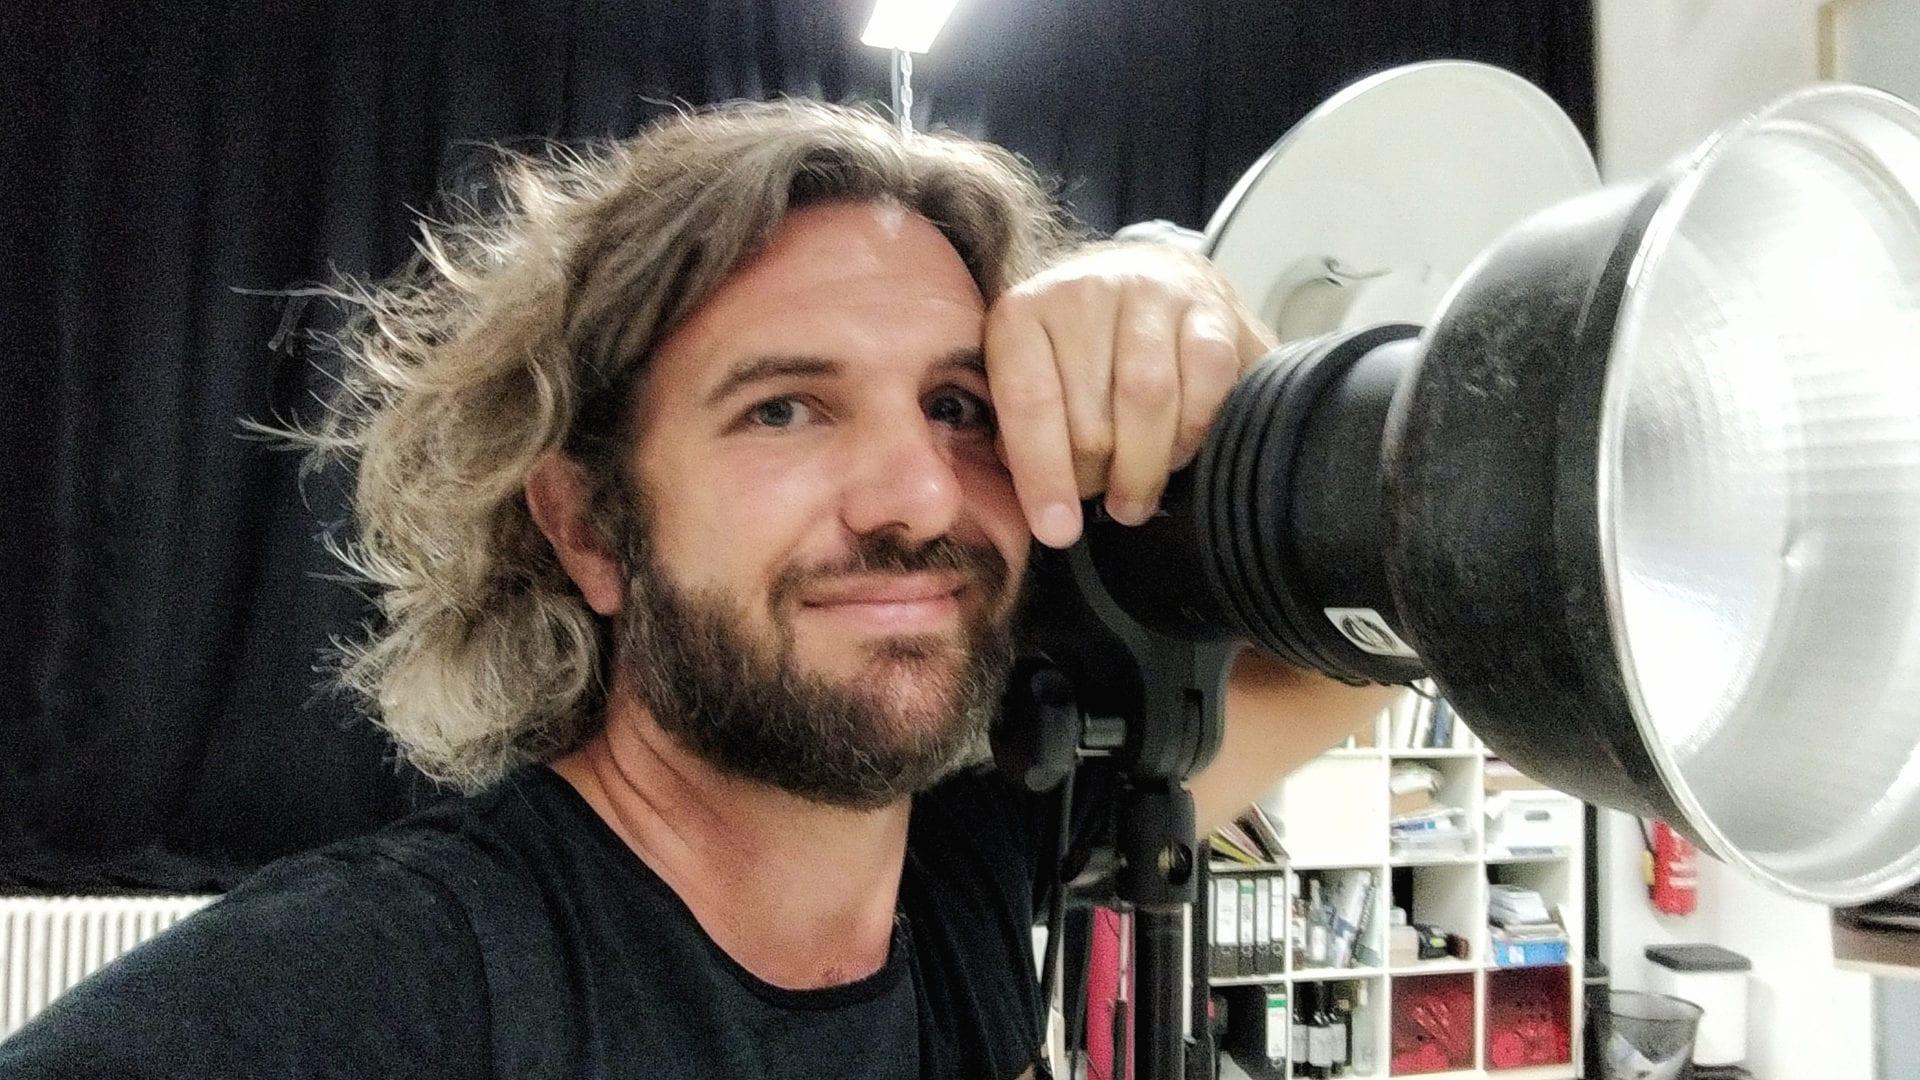 Fotograf Markus Mielek in seinem Fotostudio